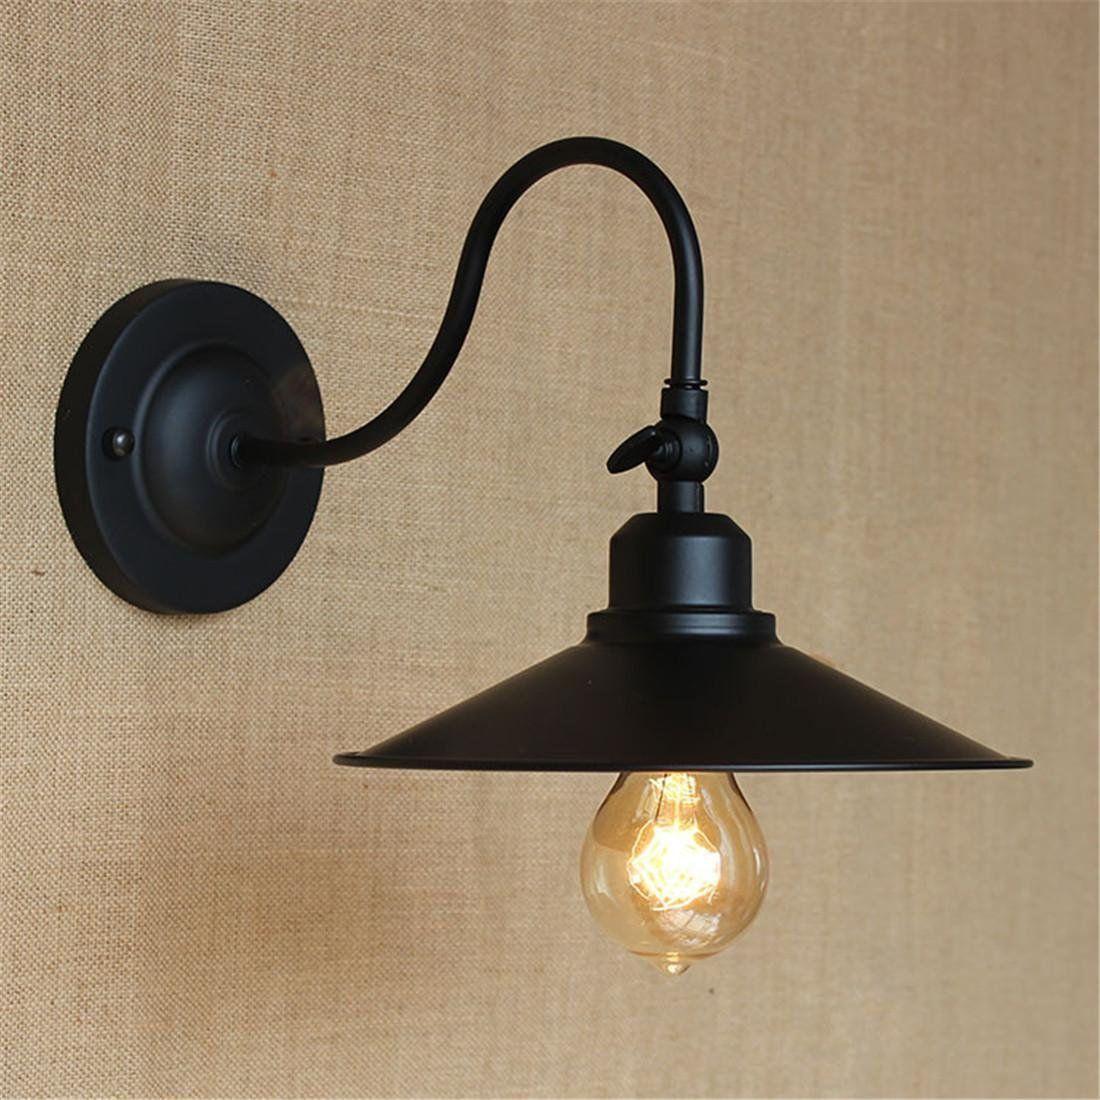 Antike Beleuchtung | Hjlhylbd American Retro Lampe Outdoor Antike Einfachheit Kreative